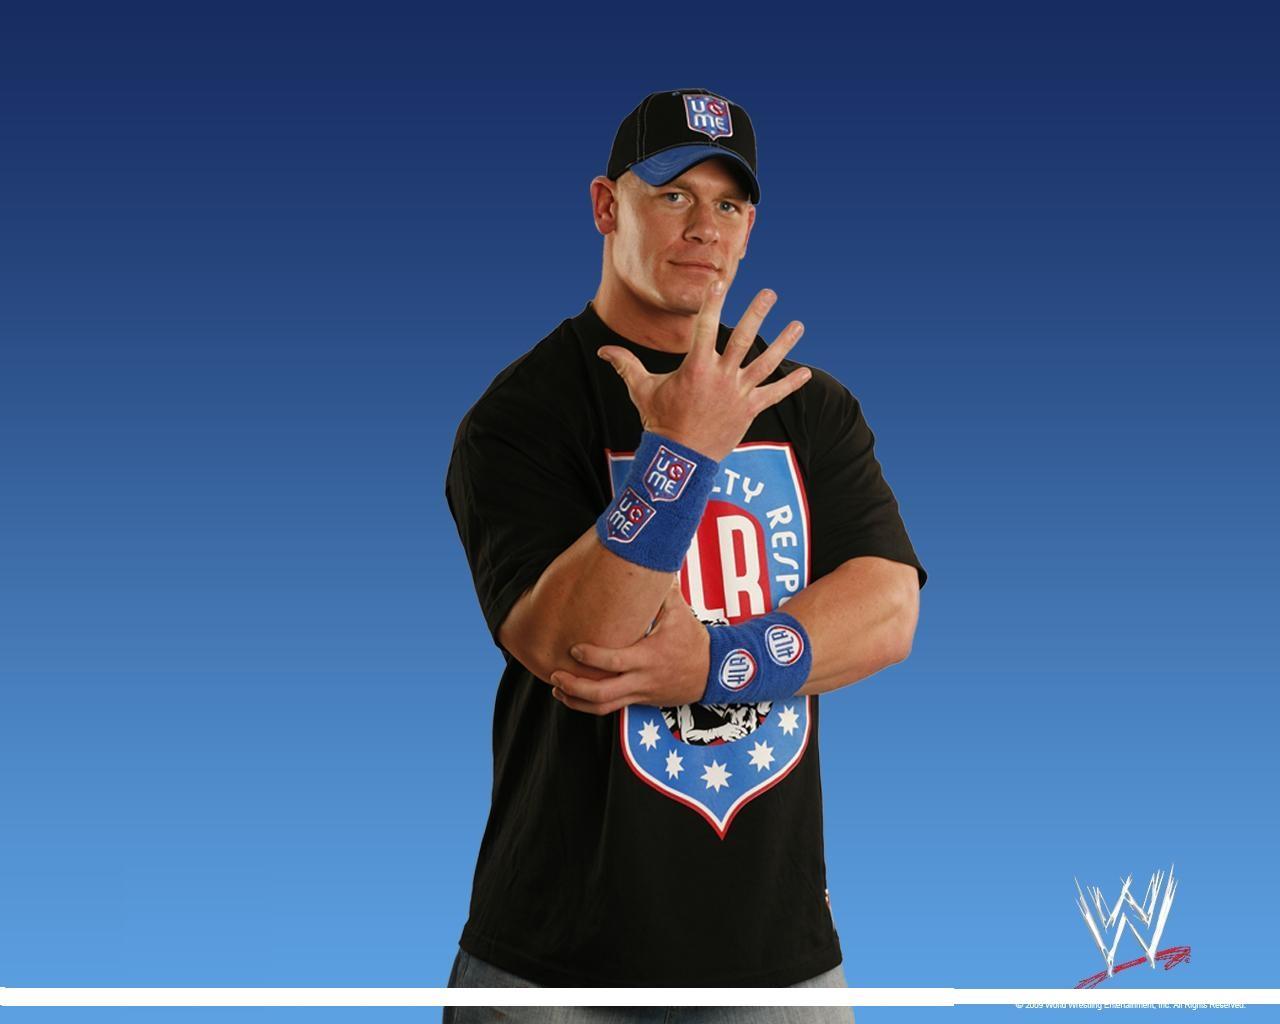 Wwe Logo Hd Wallpaper Sports All Stars John Cena Images